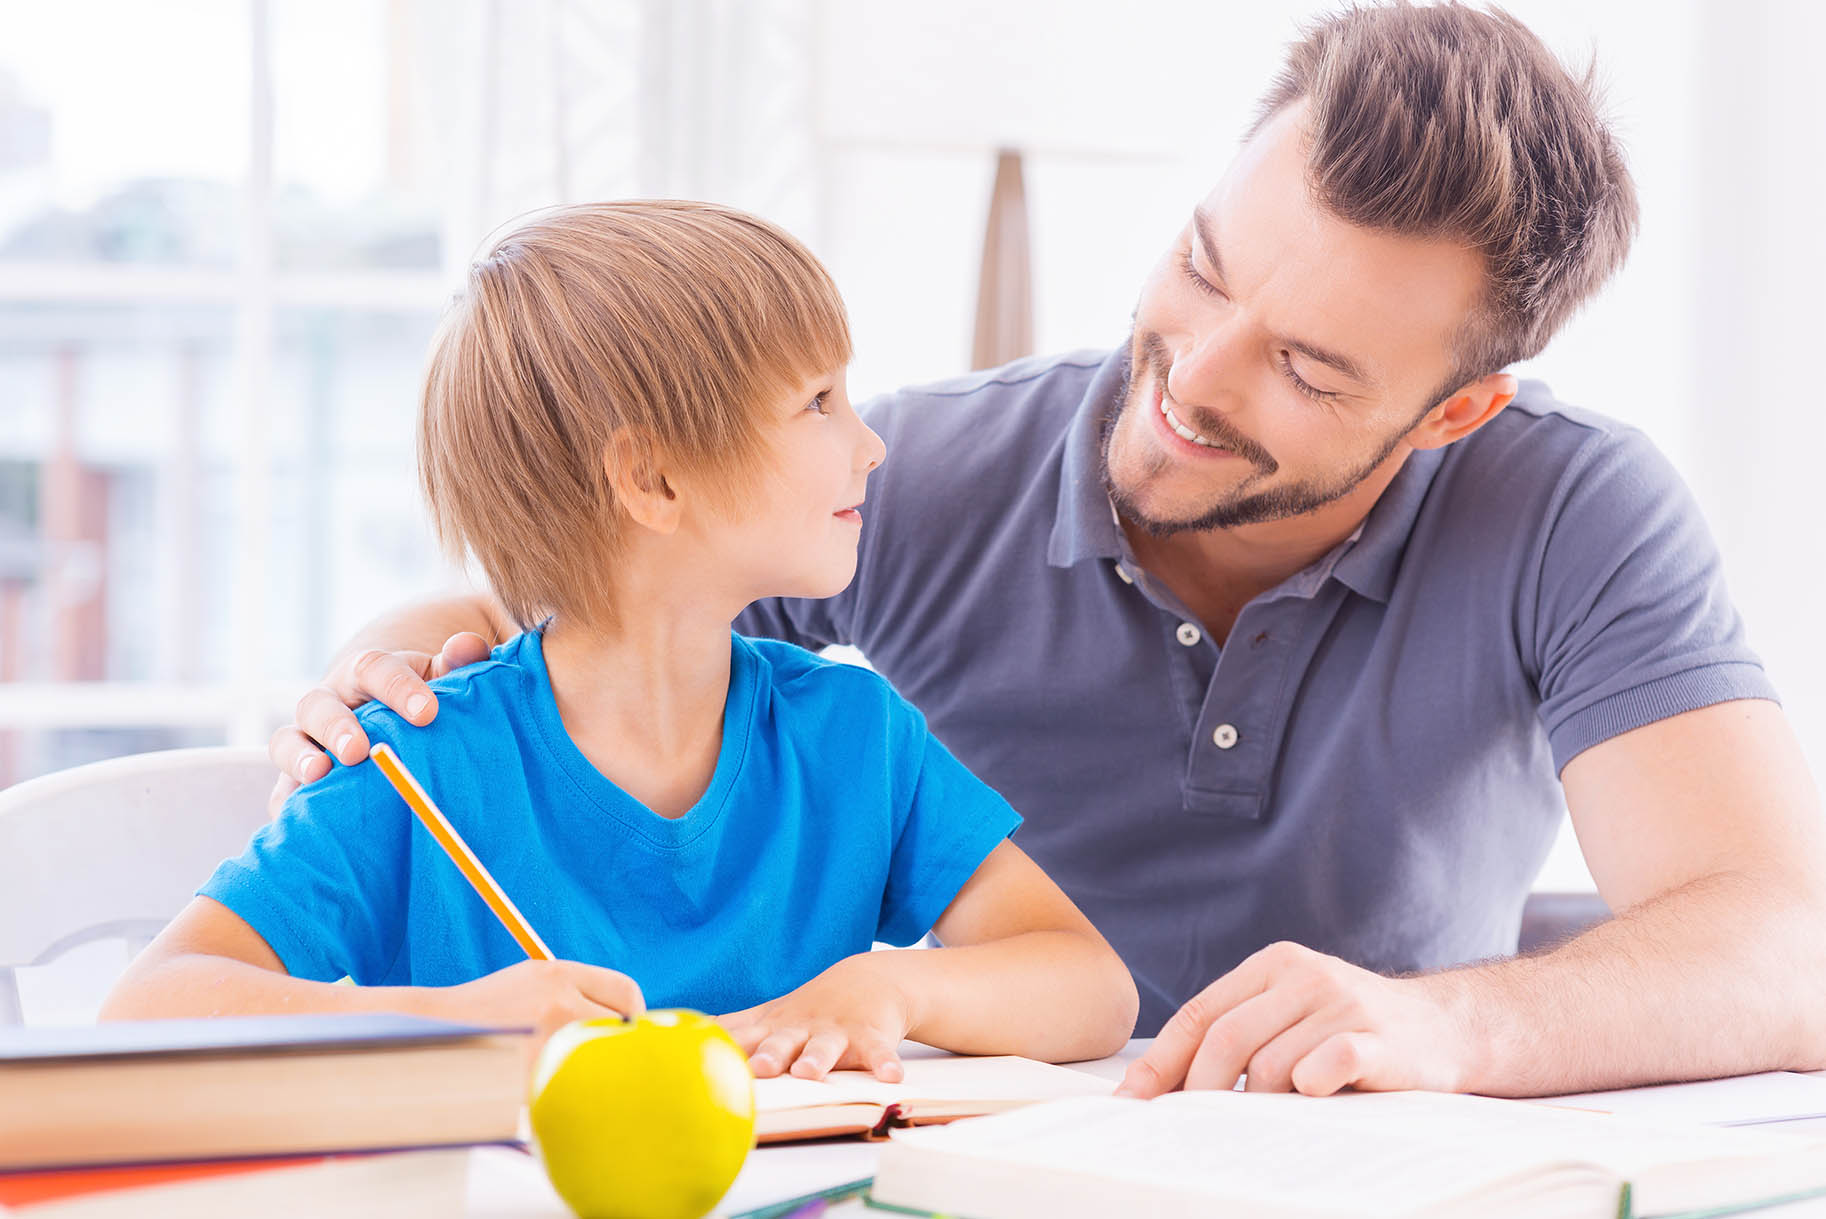 papà aiuta bambino a svolgere i compiti